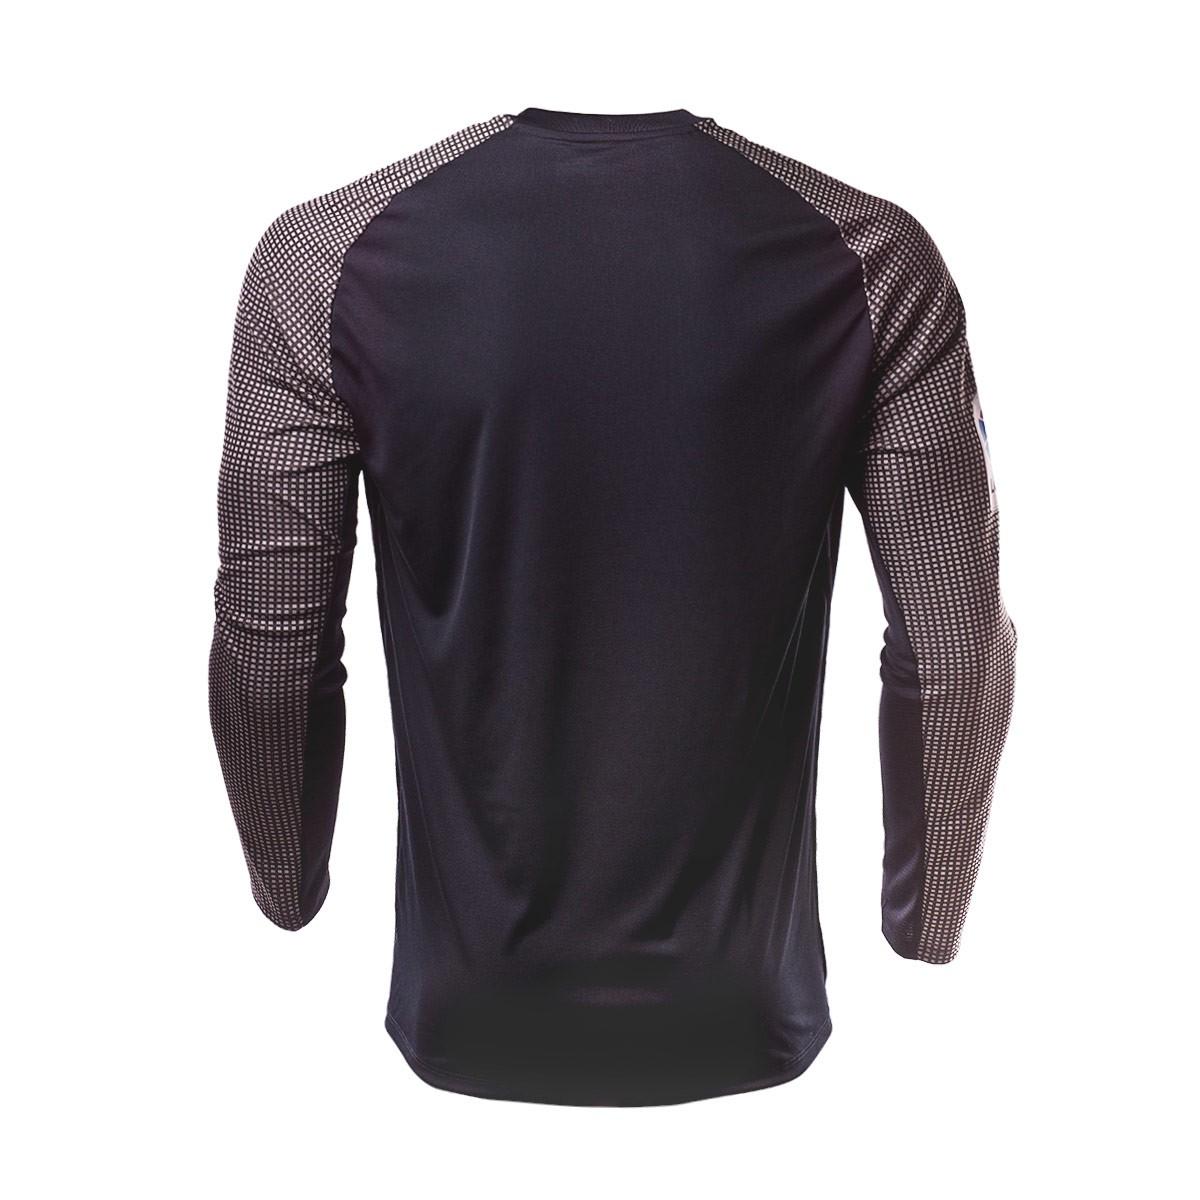 5a836f4e5b386 Camiseta New Balance AC Bilbao Primera Equipación Portero 2018-2019 Black -  Tienda de fútbol Fútbol Emotion